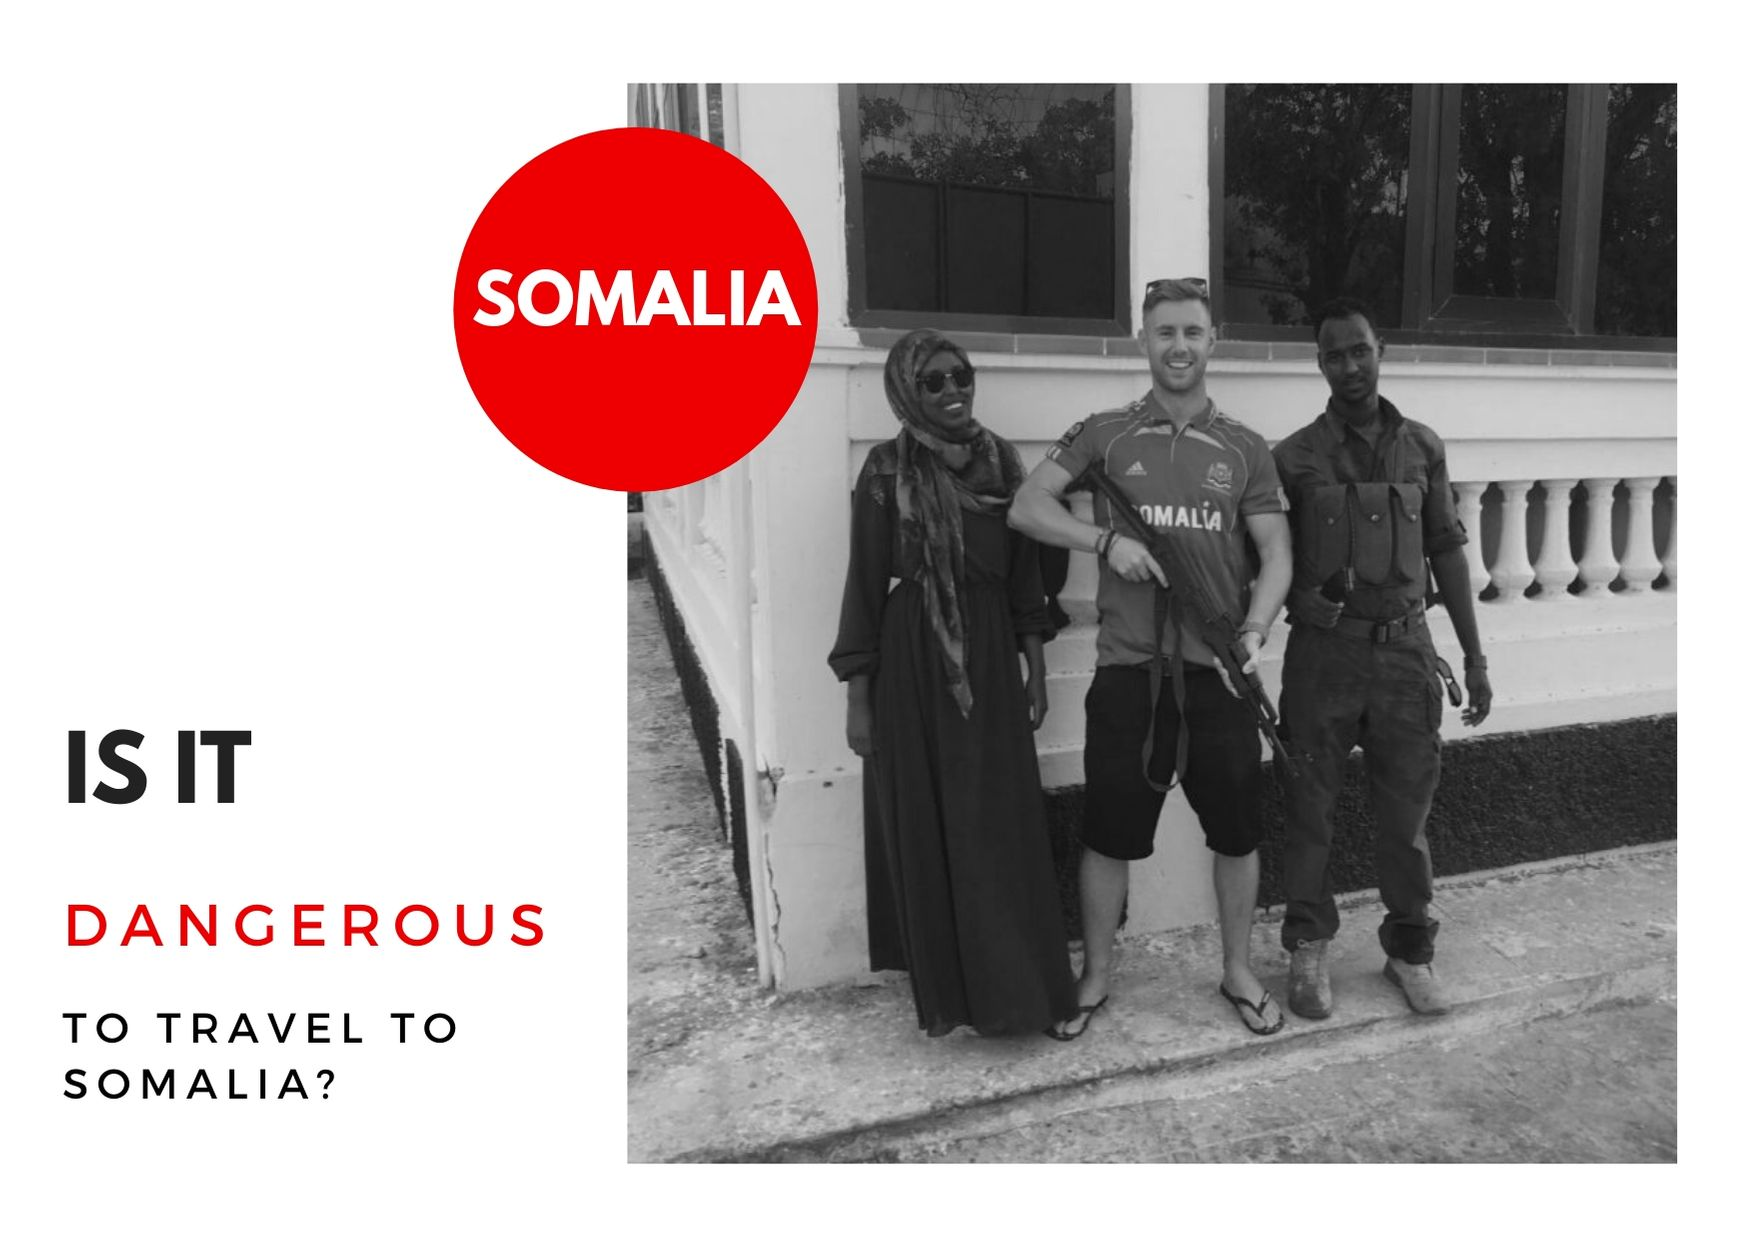 Is It Dangerous To Travel To Somalia?